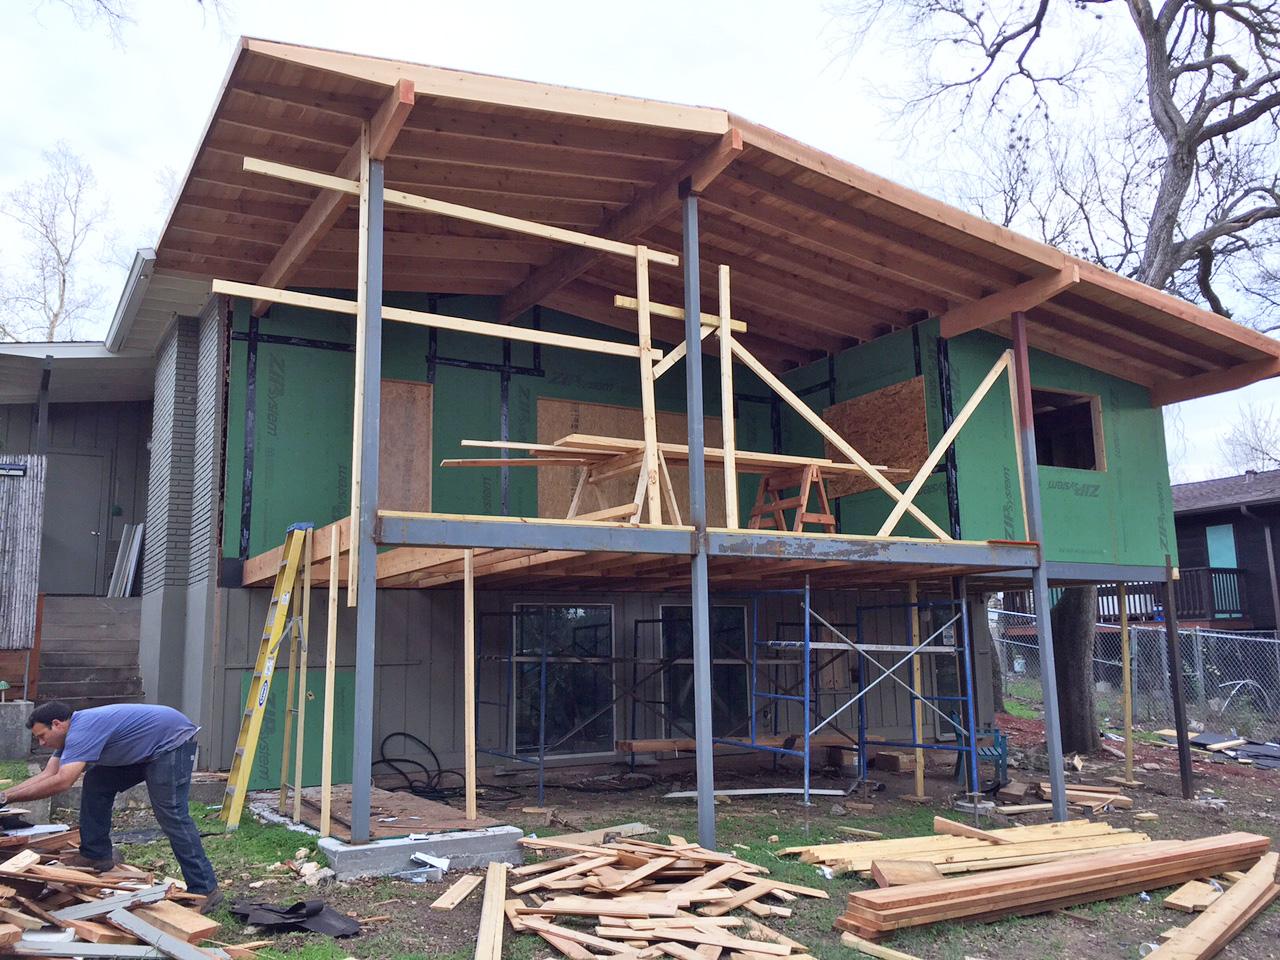 Elizabeth-Baird-Architecture-Westhill-construction screen porch.JPG